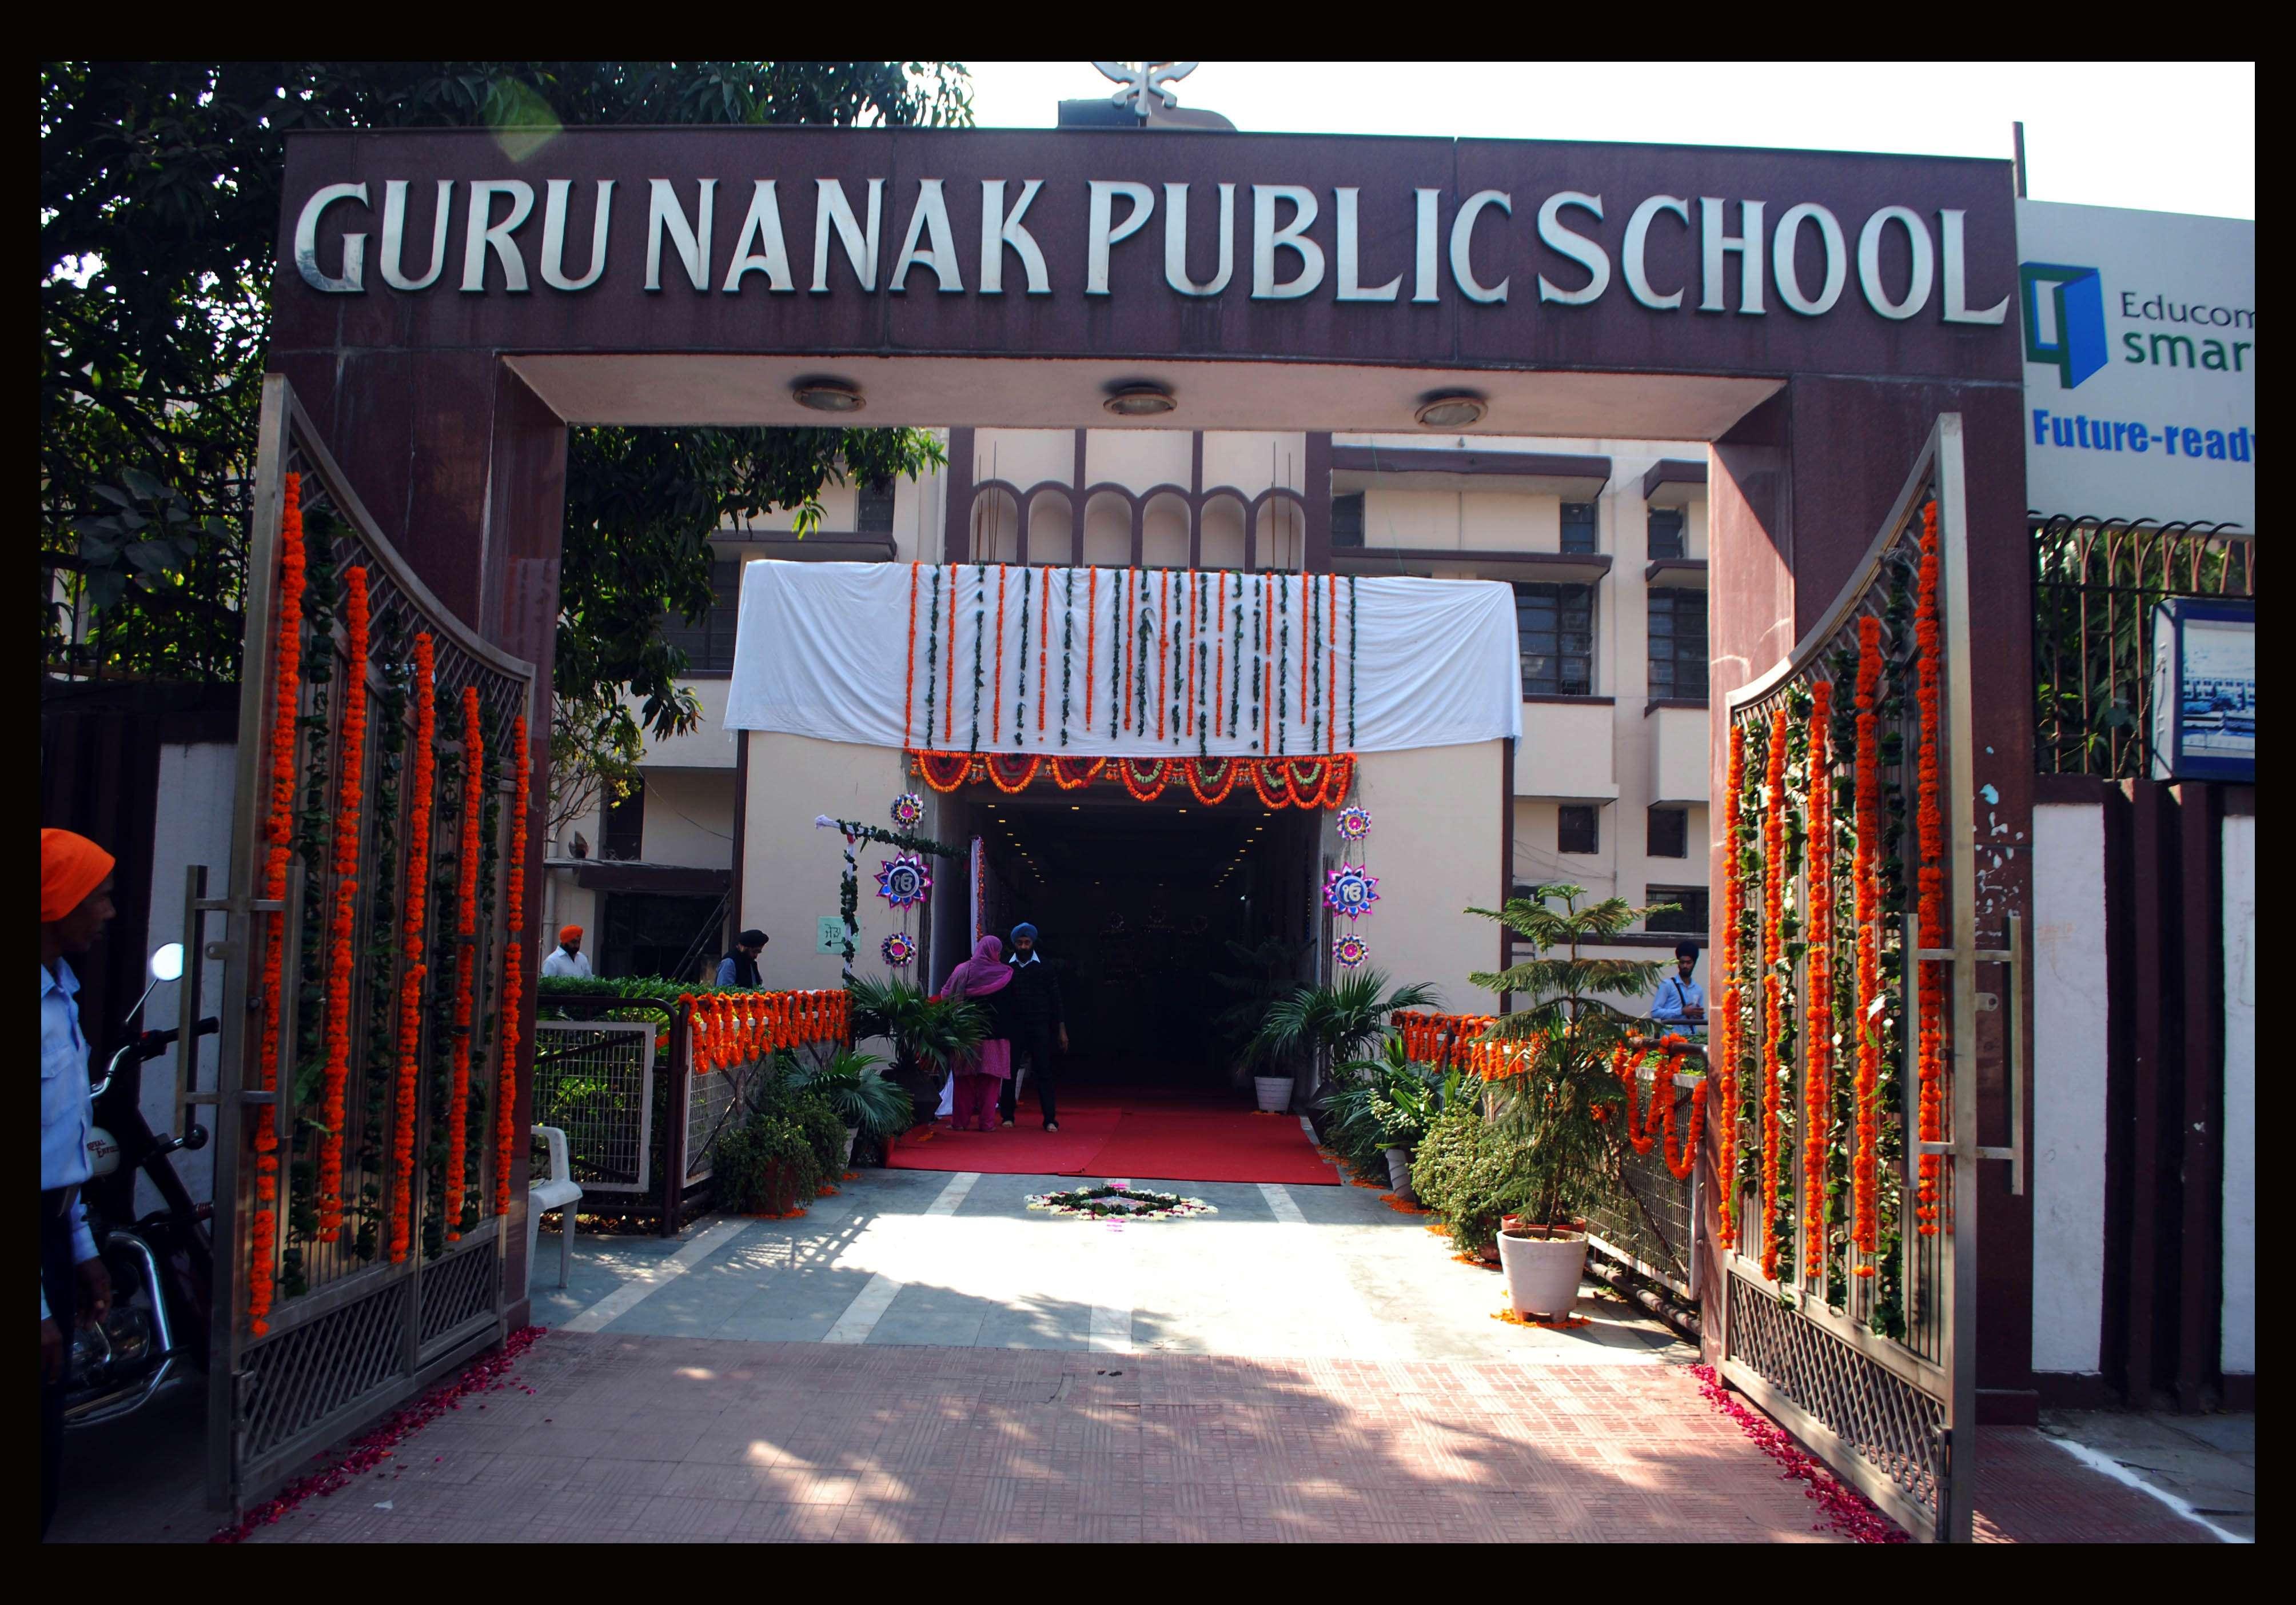 GURU NANAK PUBLIC SCHOOL WEST AVENUE PUNJABI BAGH NEW DELHI 2730058